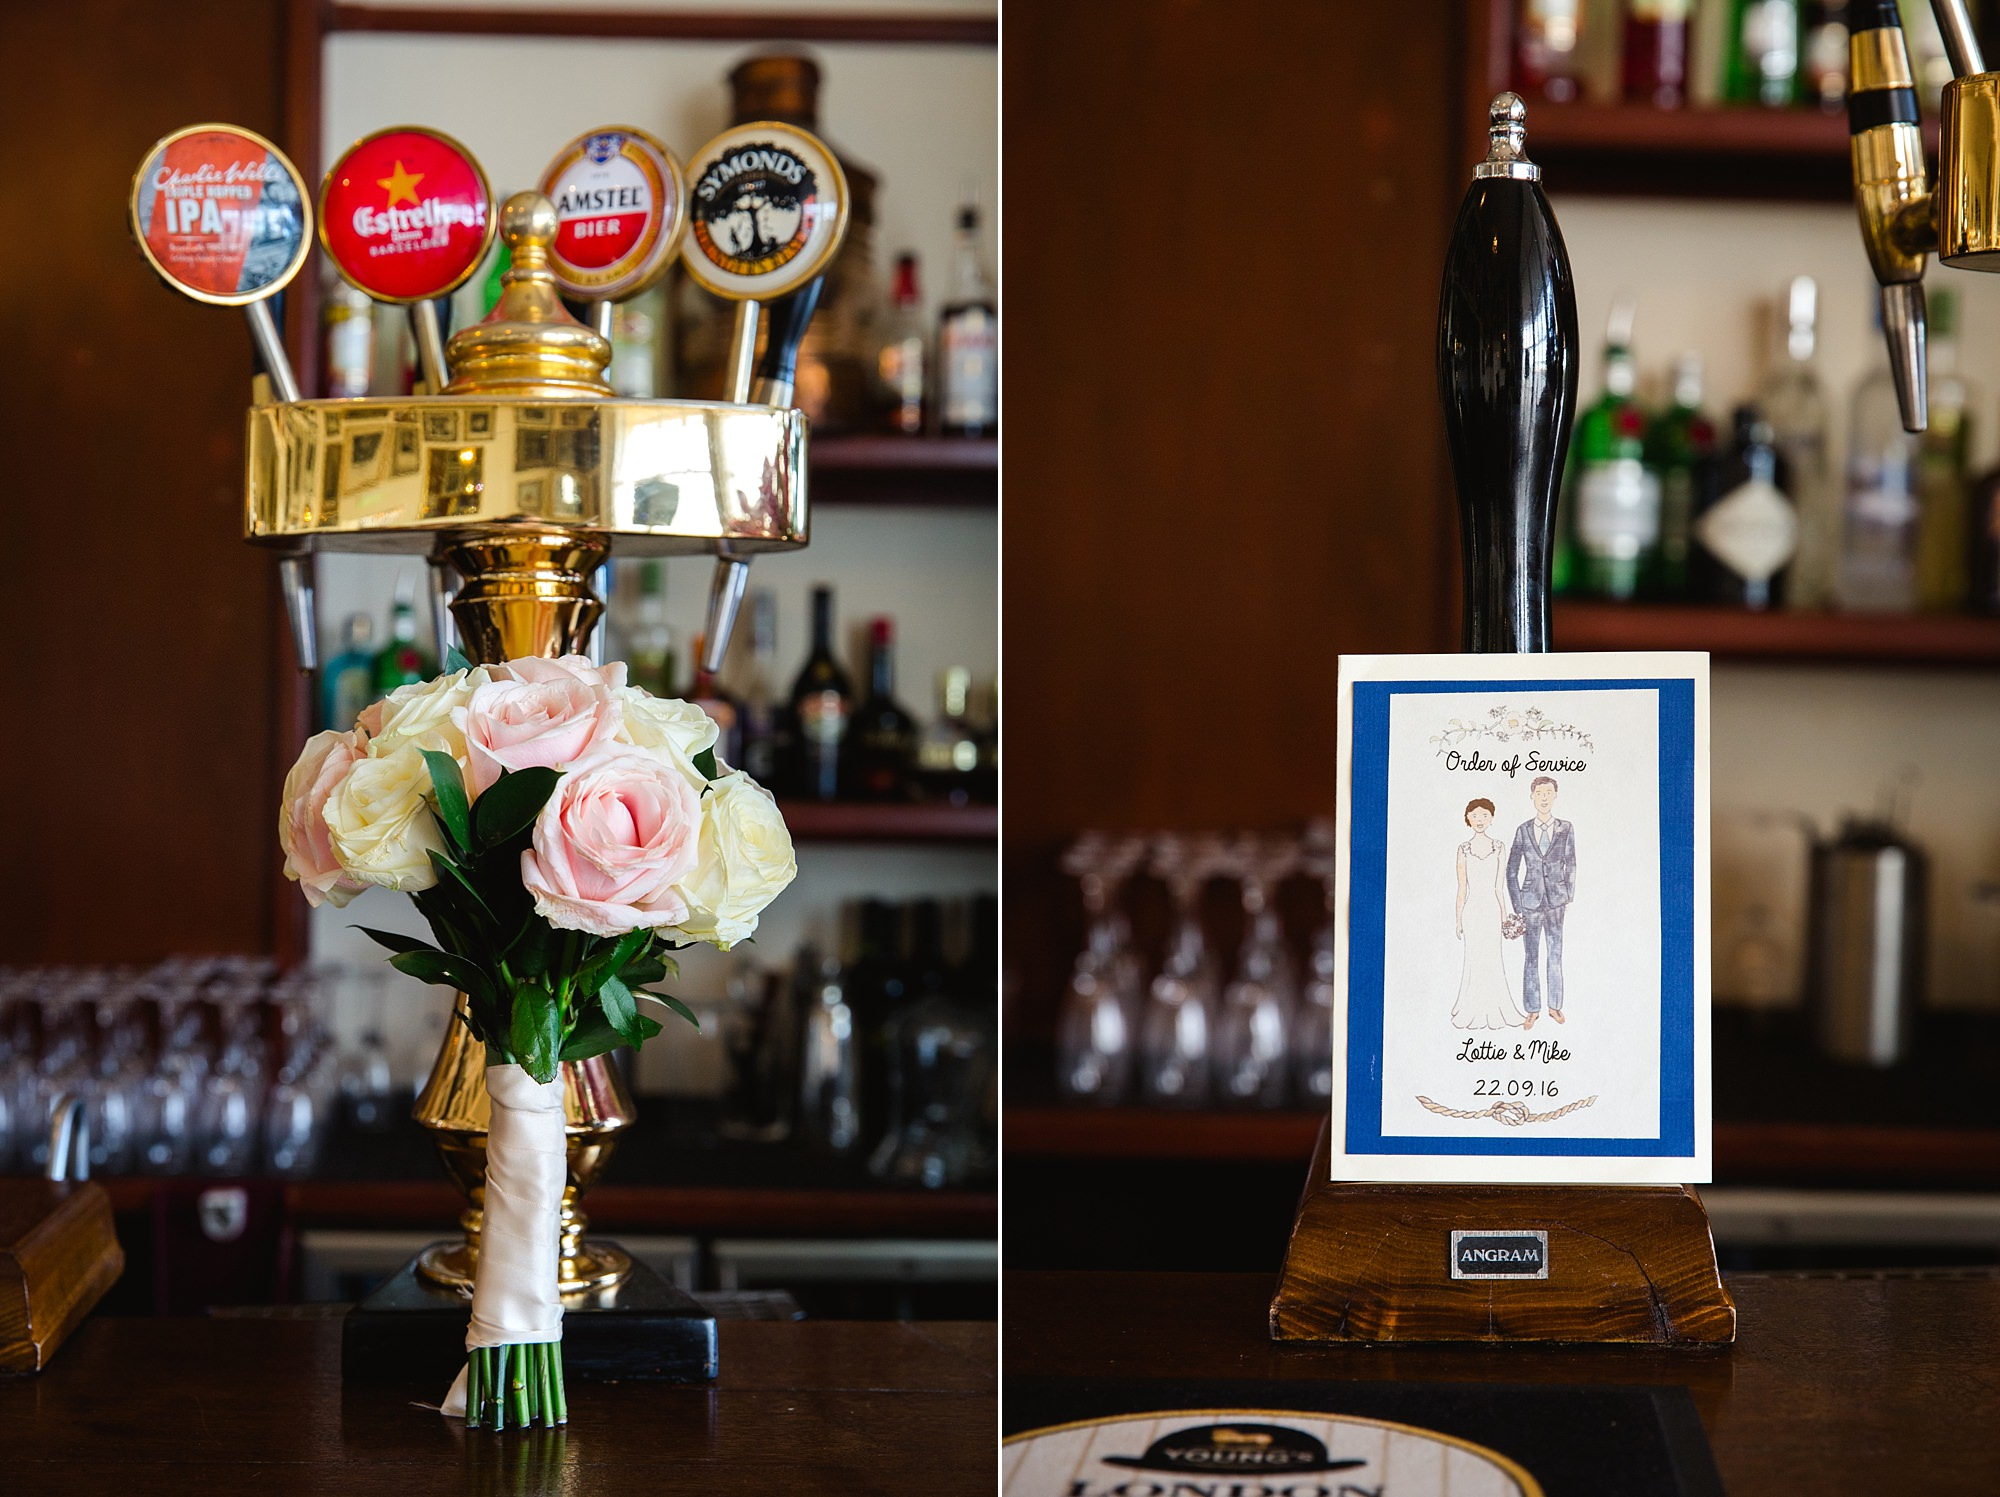 Trafalgar Tavern wedding bouquet and invitation details